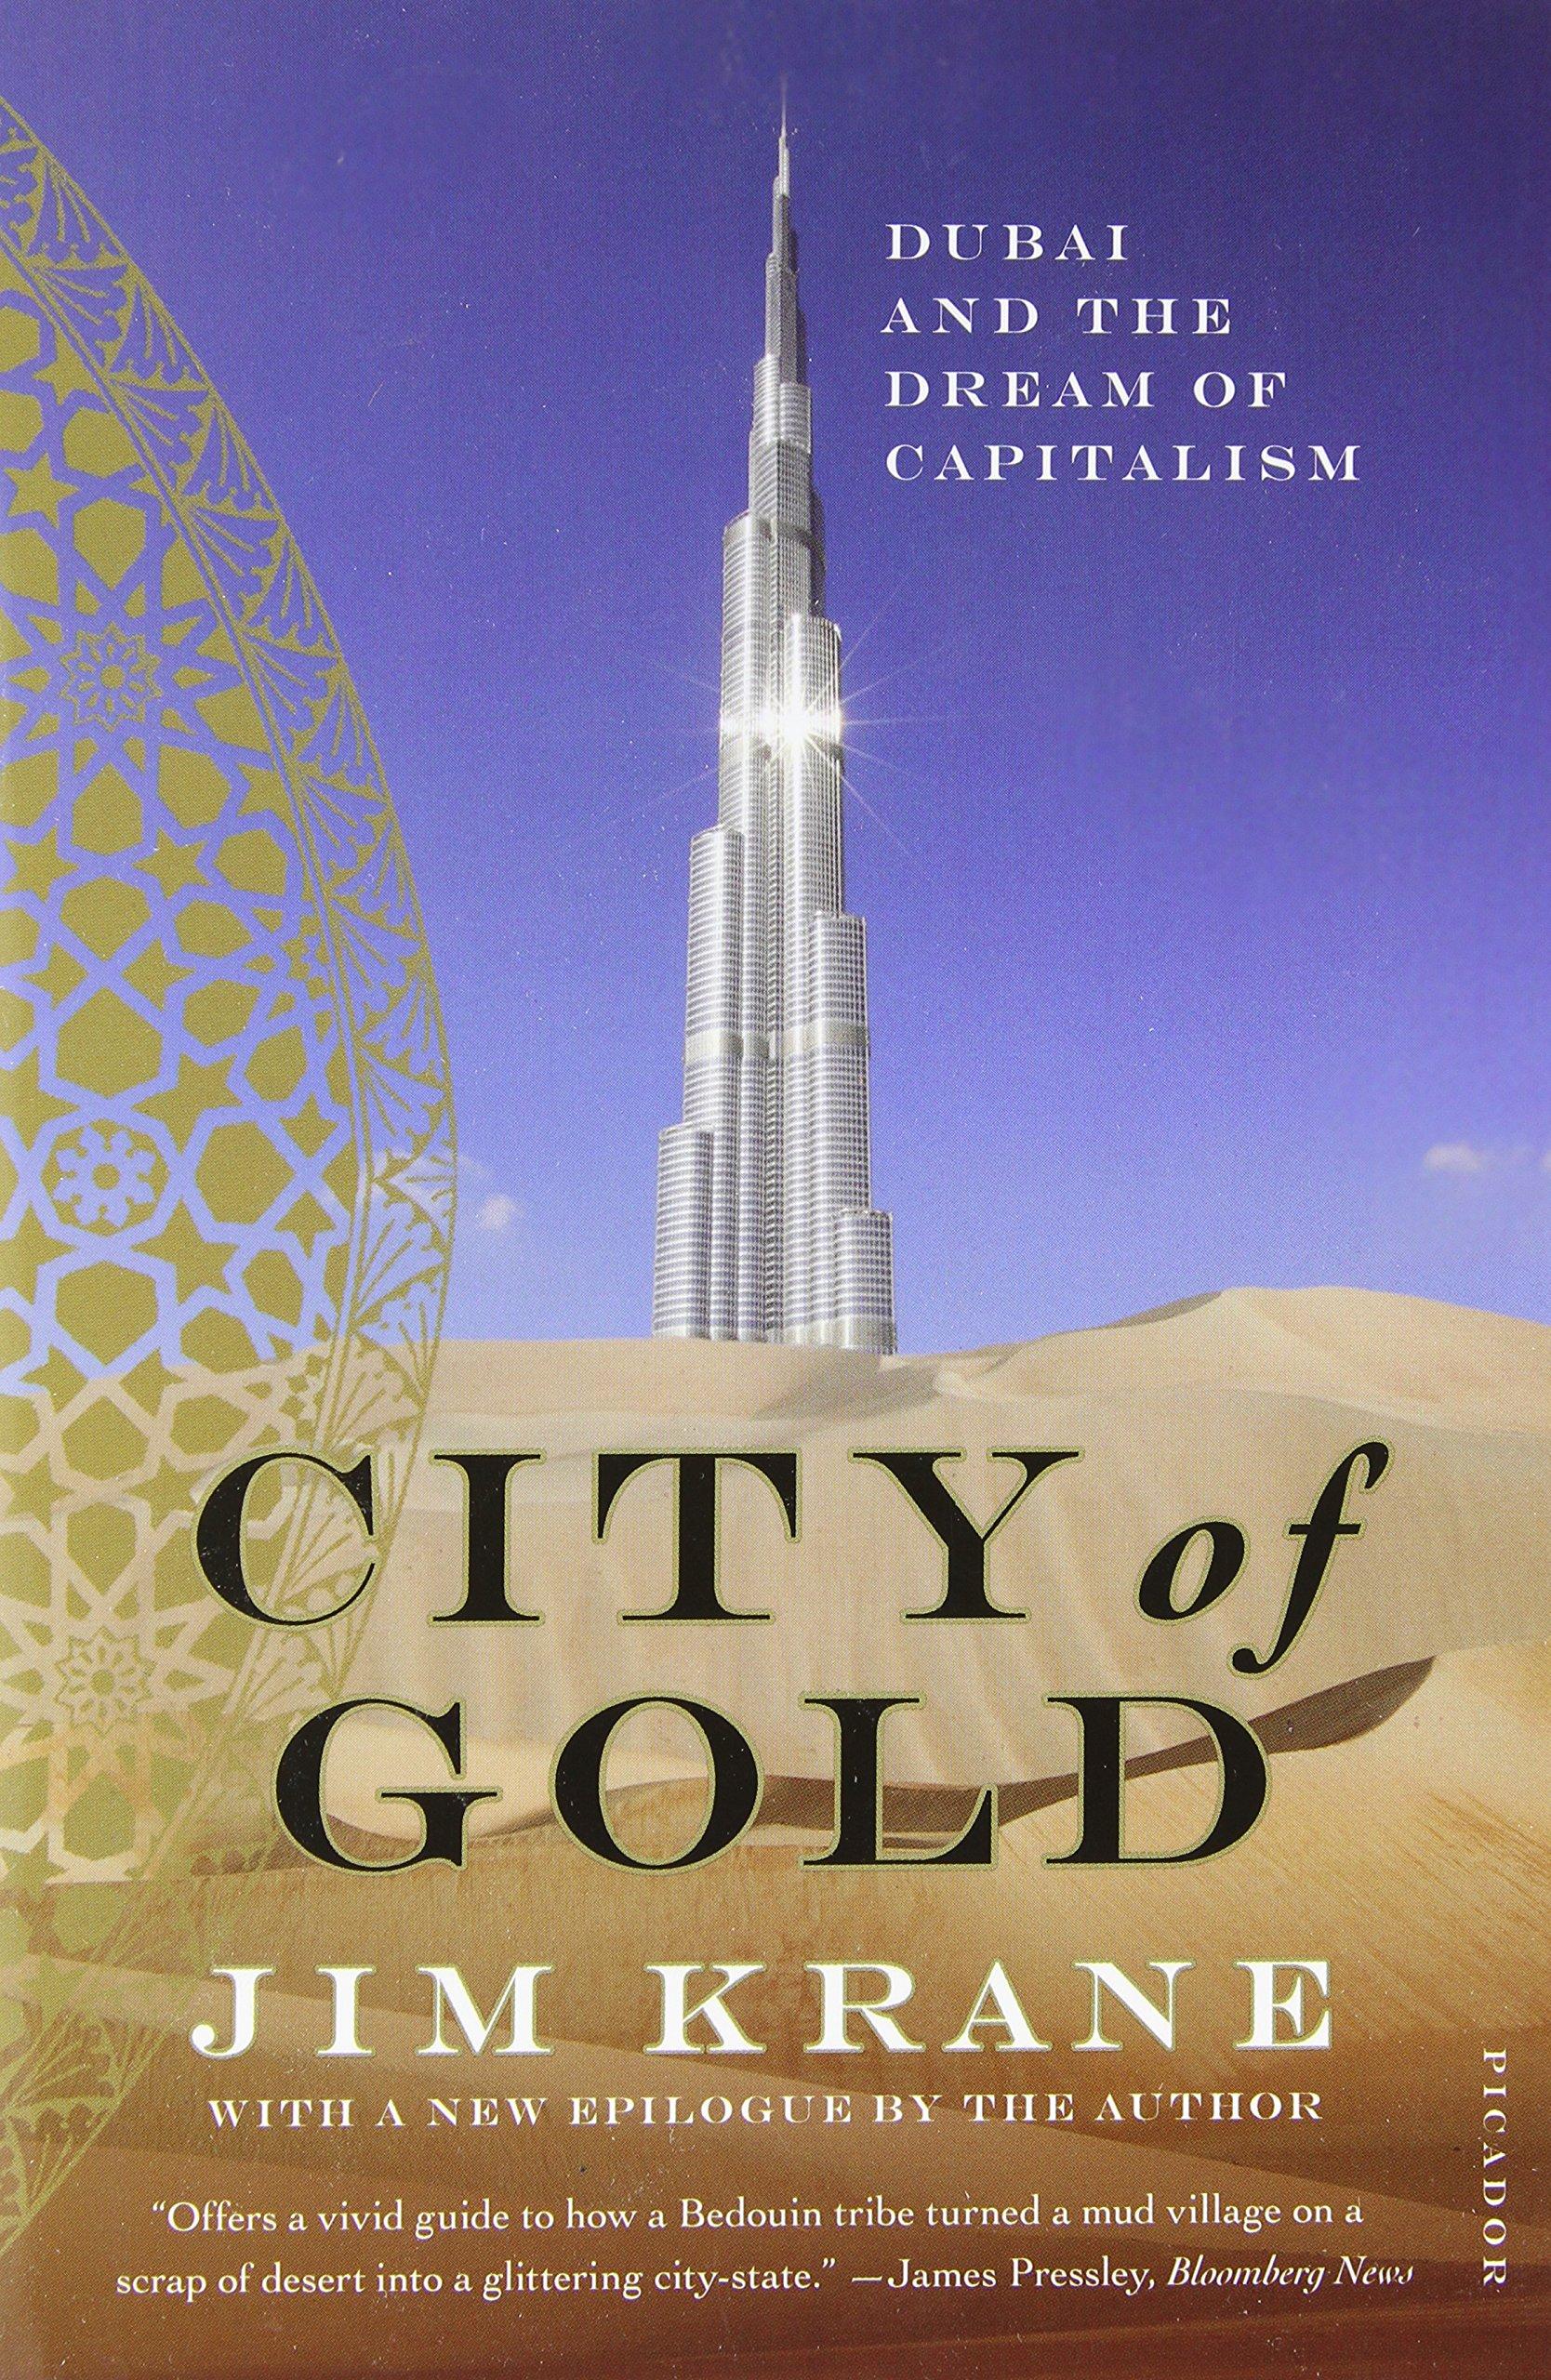 city of gold dubai and the dream of capitalism jim krane